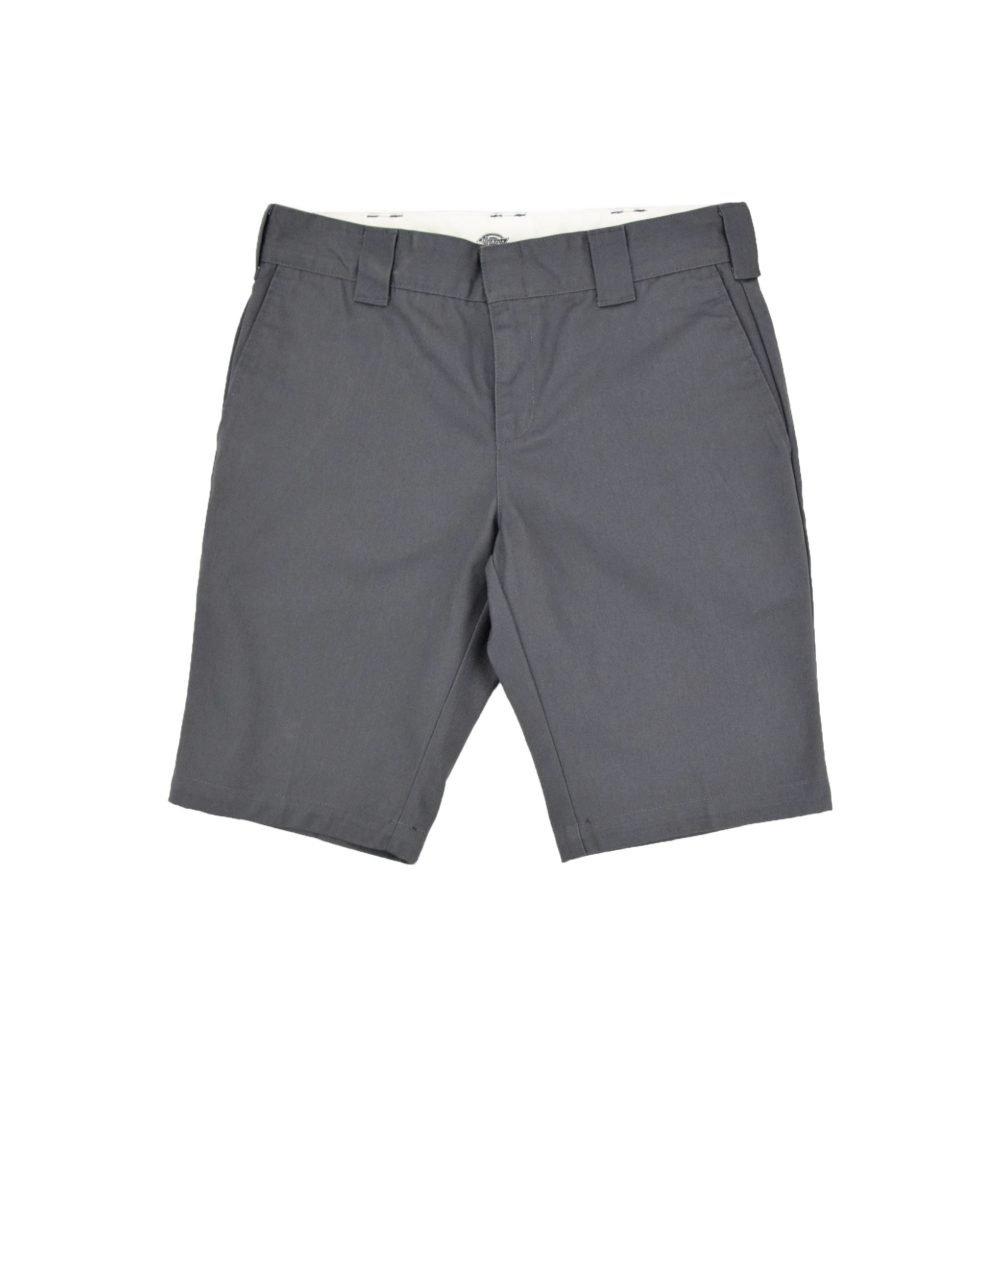 Dickies Slim Fit Shorts (DK0A4XB1CH01) Charcoal Grey